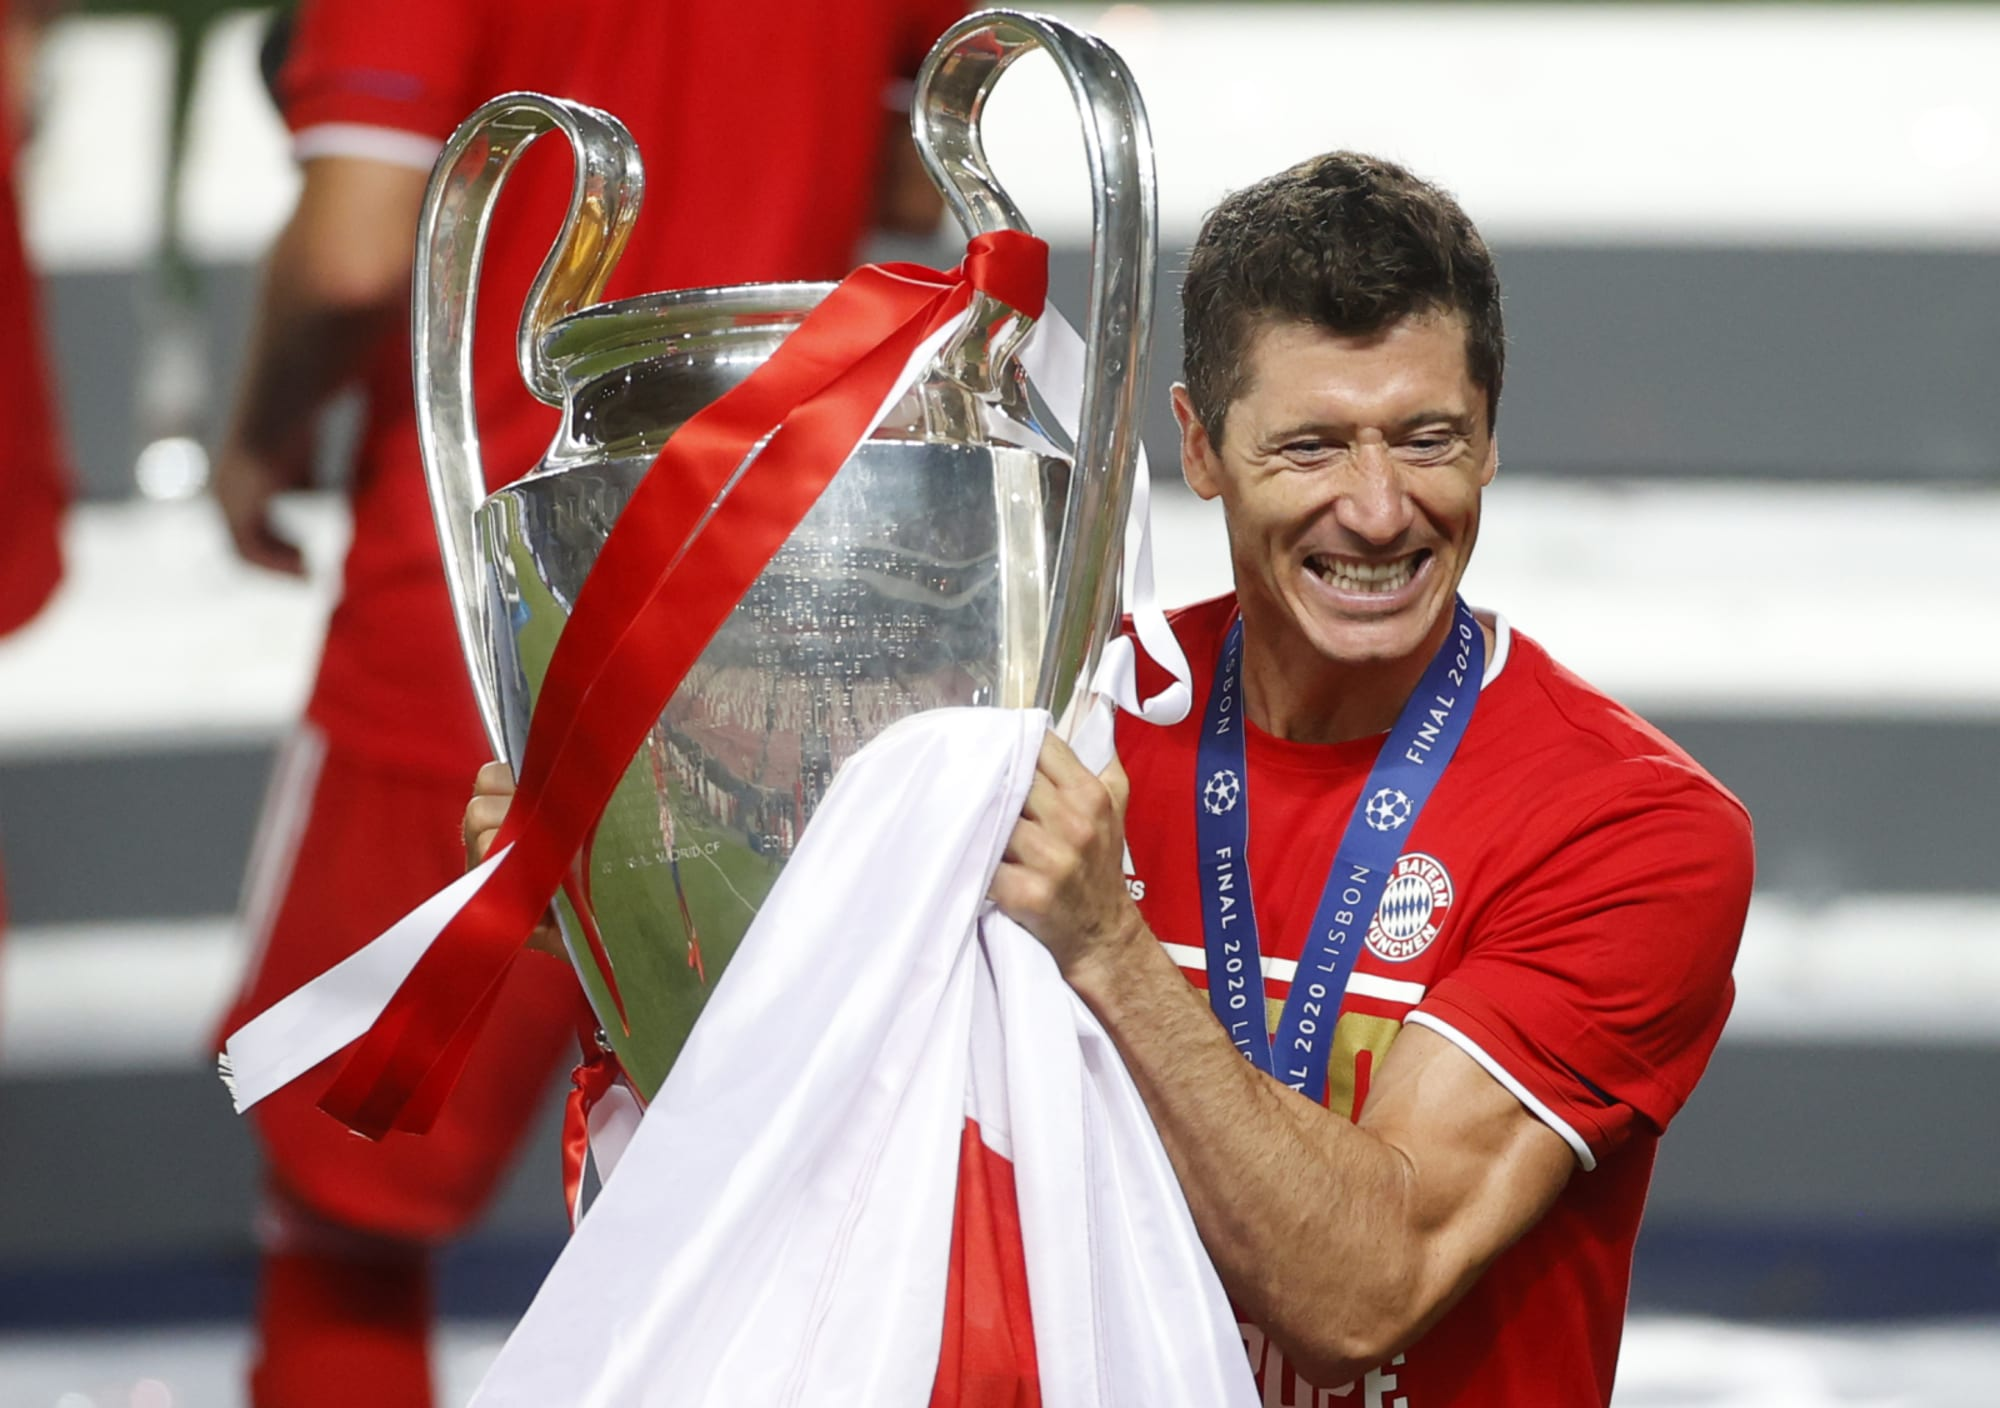 Manchester United have made offer to Robert Lewandowski